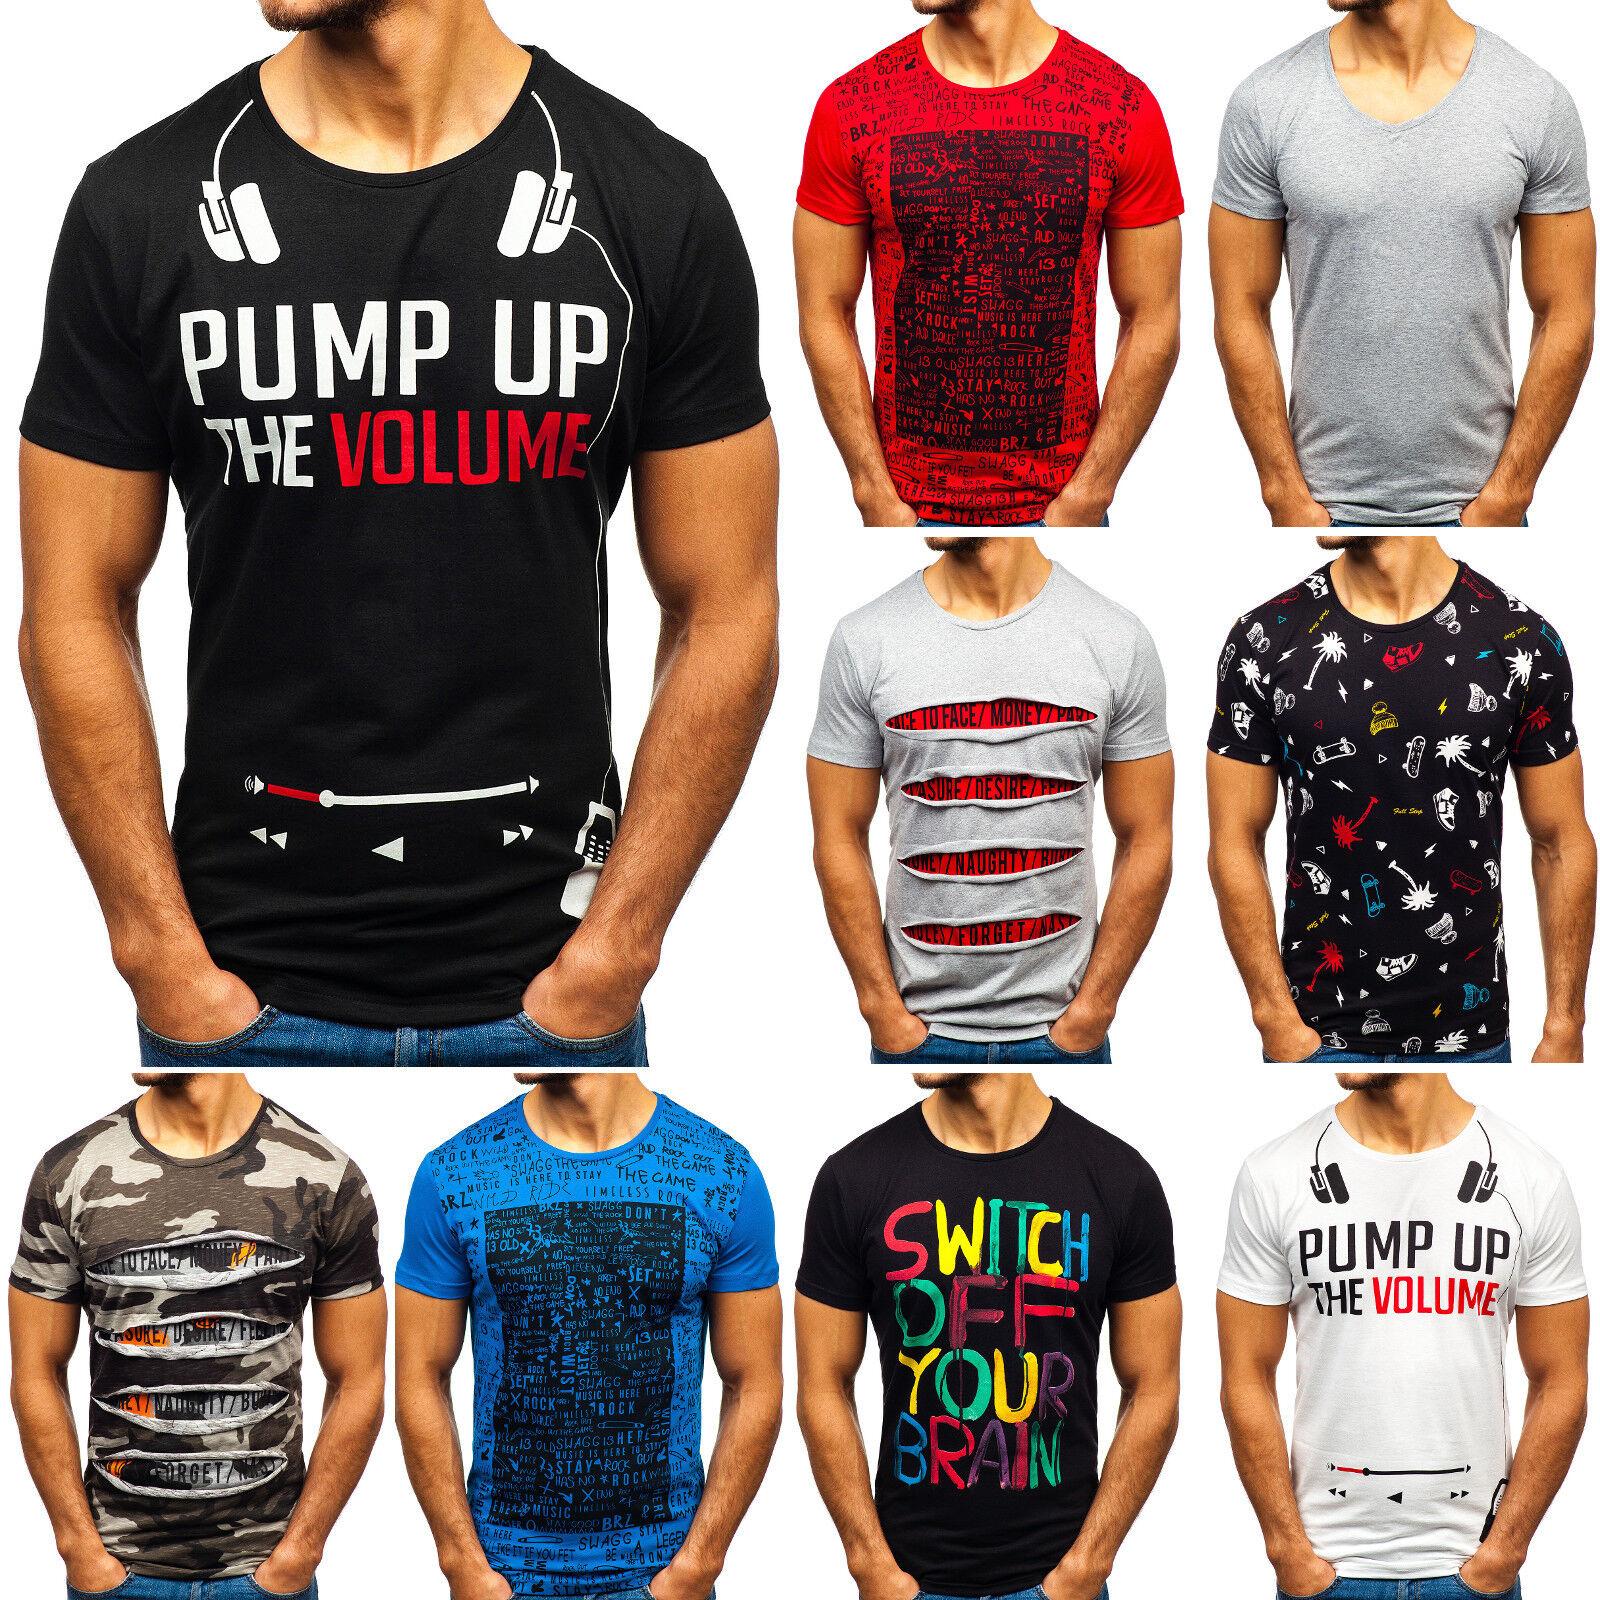 5b01902ff0bedd T-Shirt Tee Kurzarm Rundhals Aufdruck Print Casual Herren Mix BOLF 3C3  Motiv WOW